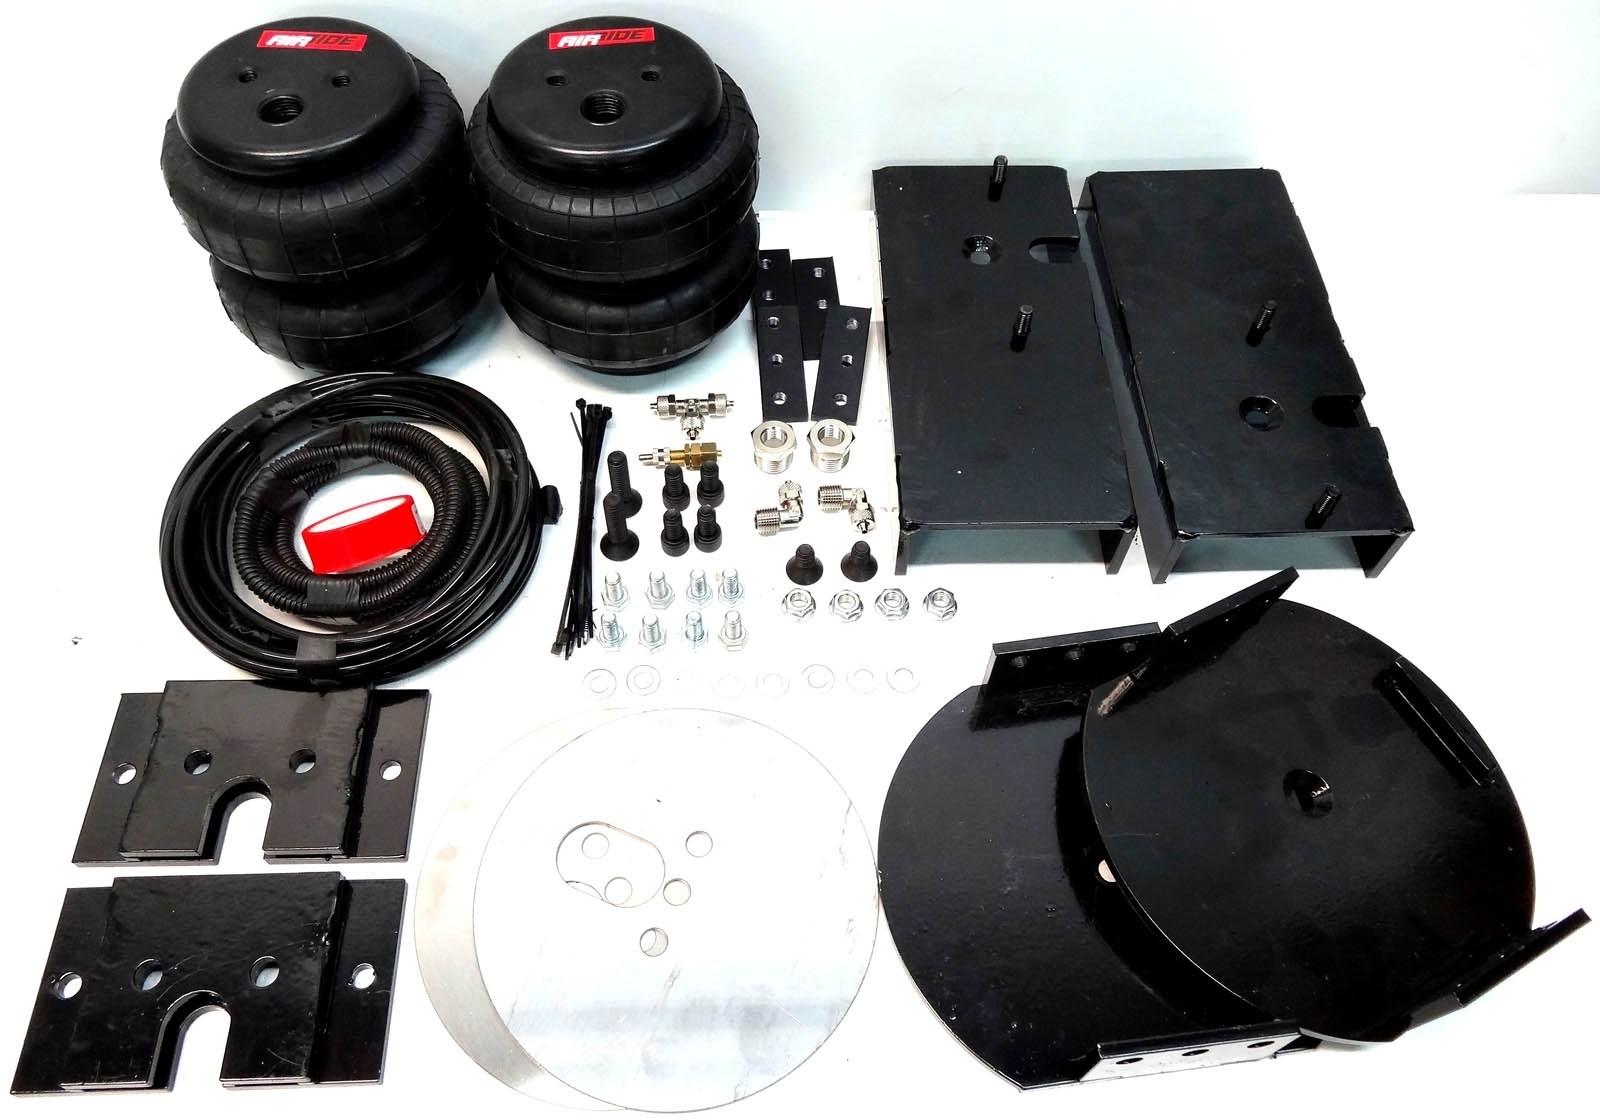 Air-Ride 152010пневмоподвеска наRenaultMaster X62 / Opel Movano X62 / Nissan Interstar X62 задний привод (11-) задняя ось